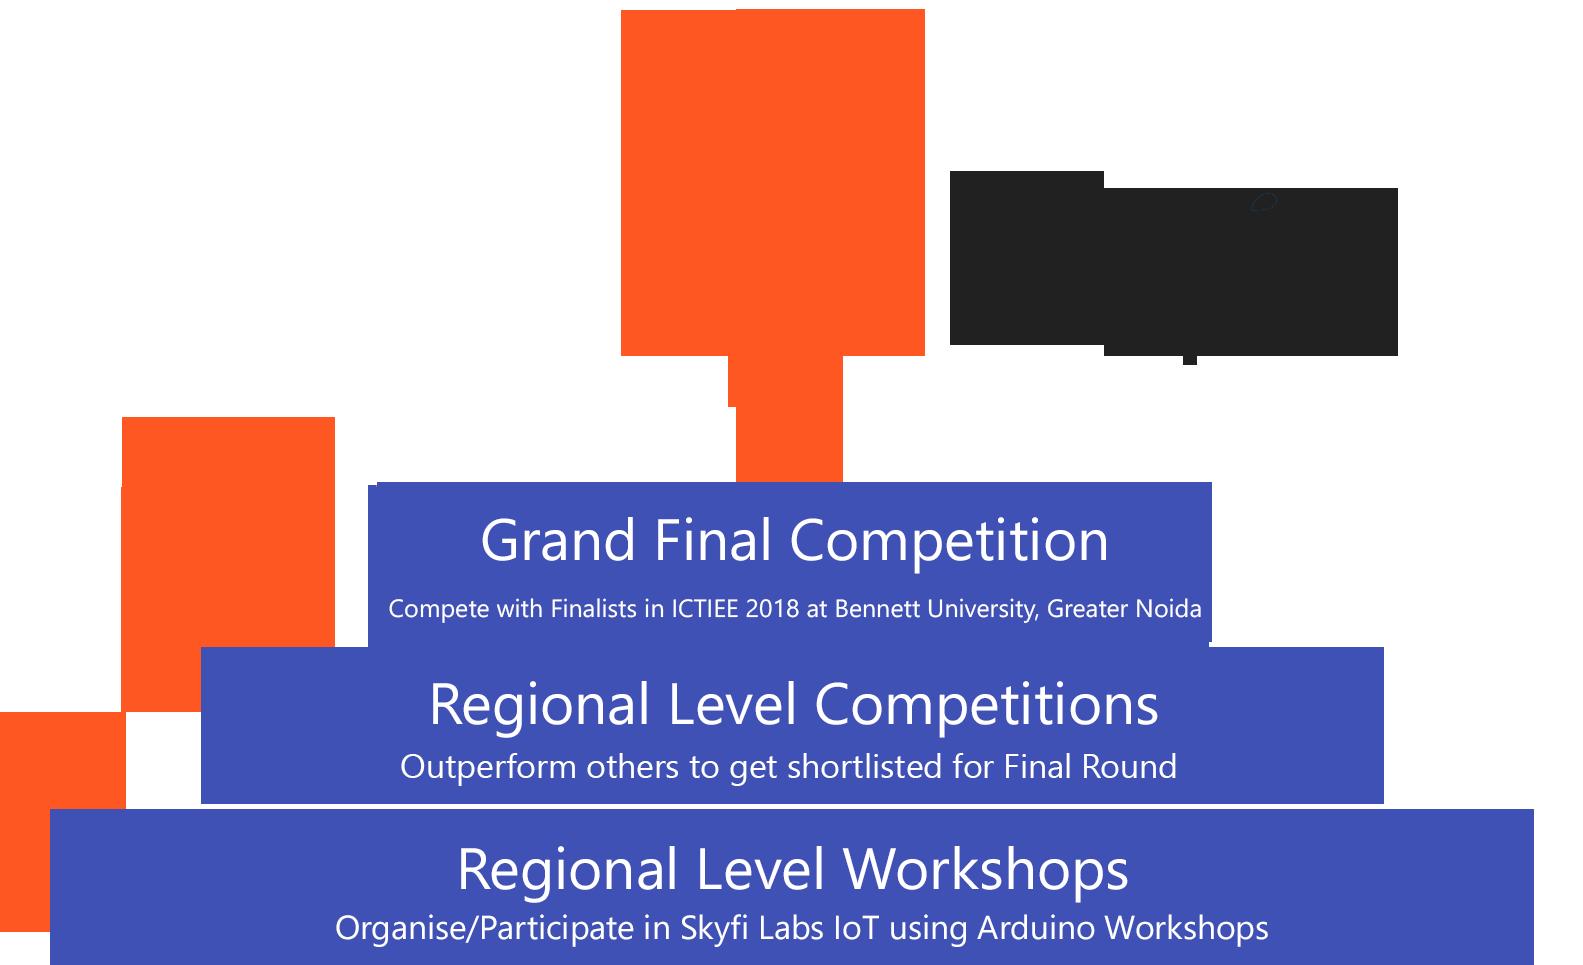 Roboversity IUCEE Challenge - Organize Workshop